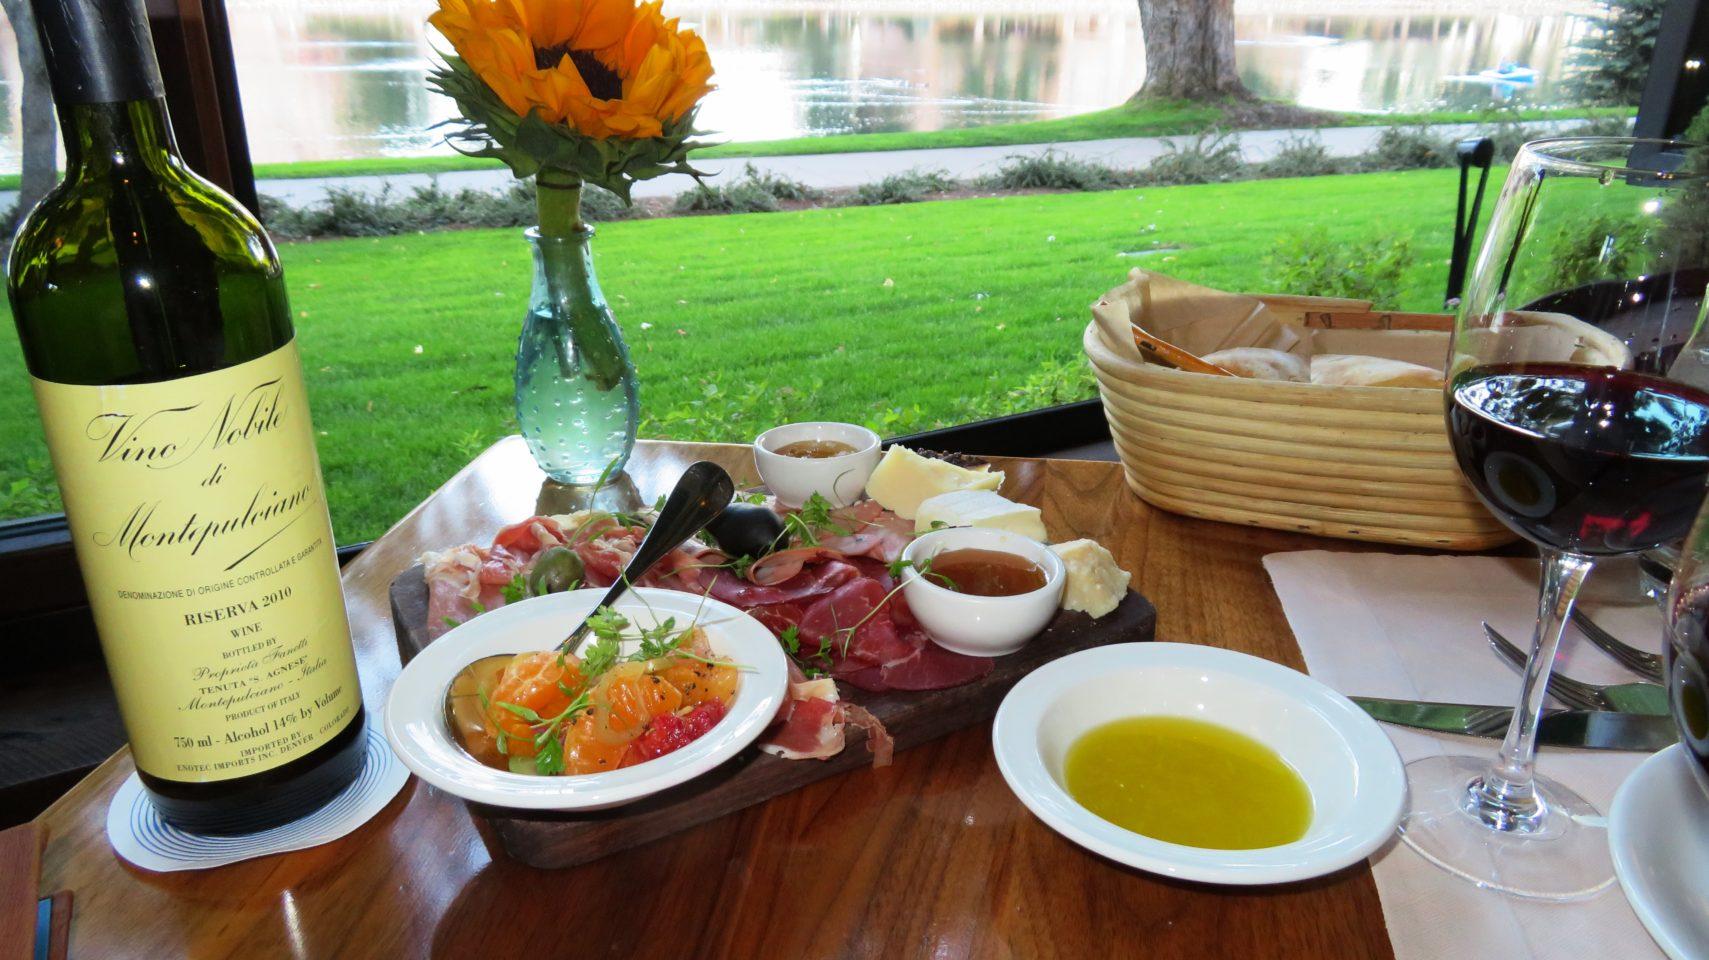 Culinary Excellence at The Broadmoor ~ Antipasto at the Ristorante del Lago